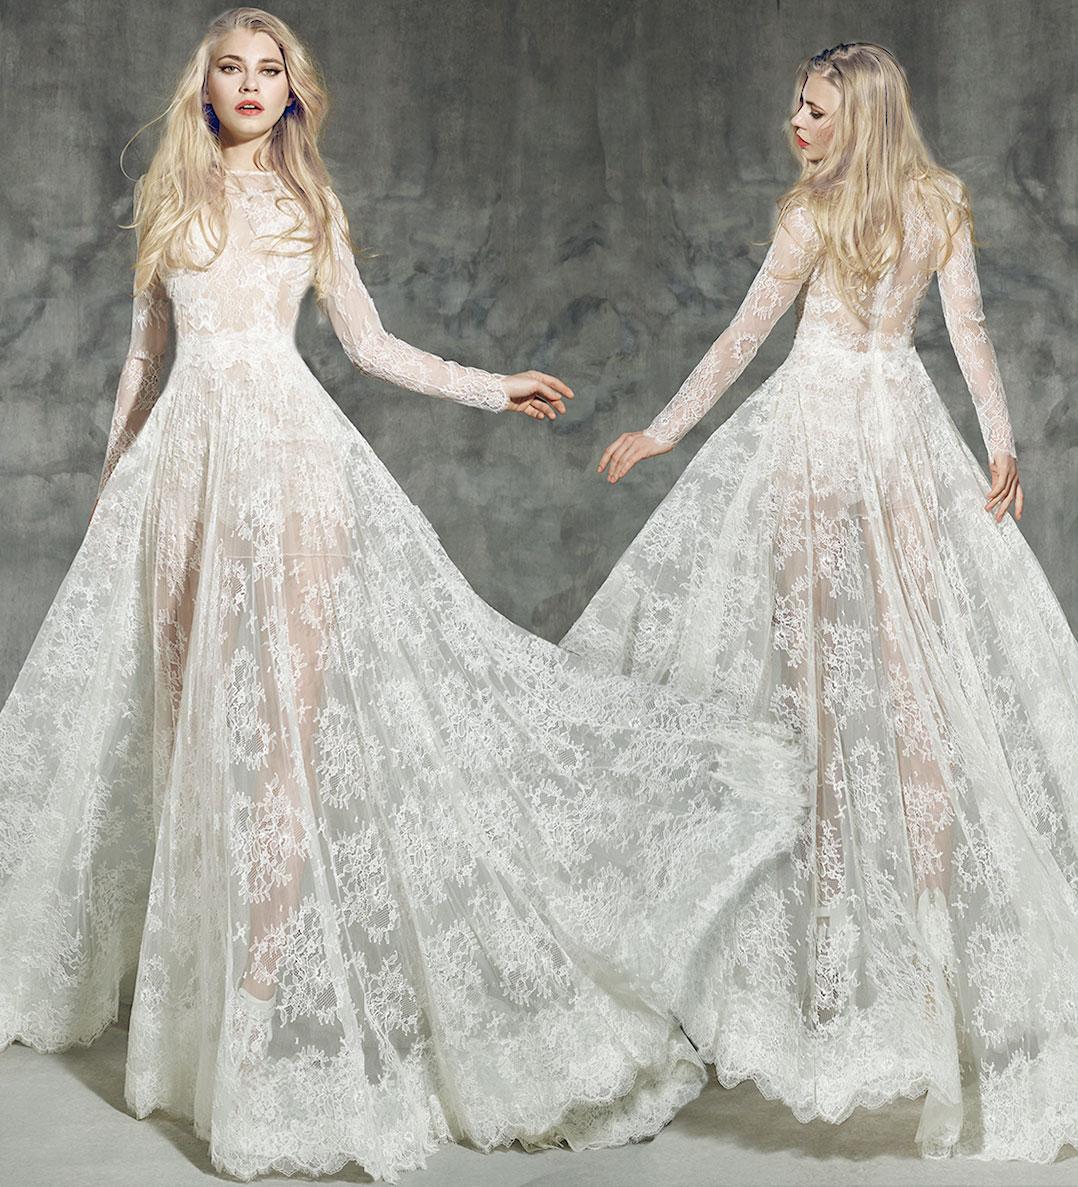 wedding dresses 2016 winter photo - 1